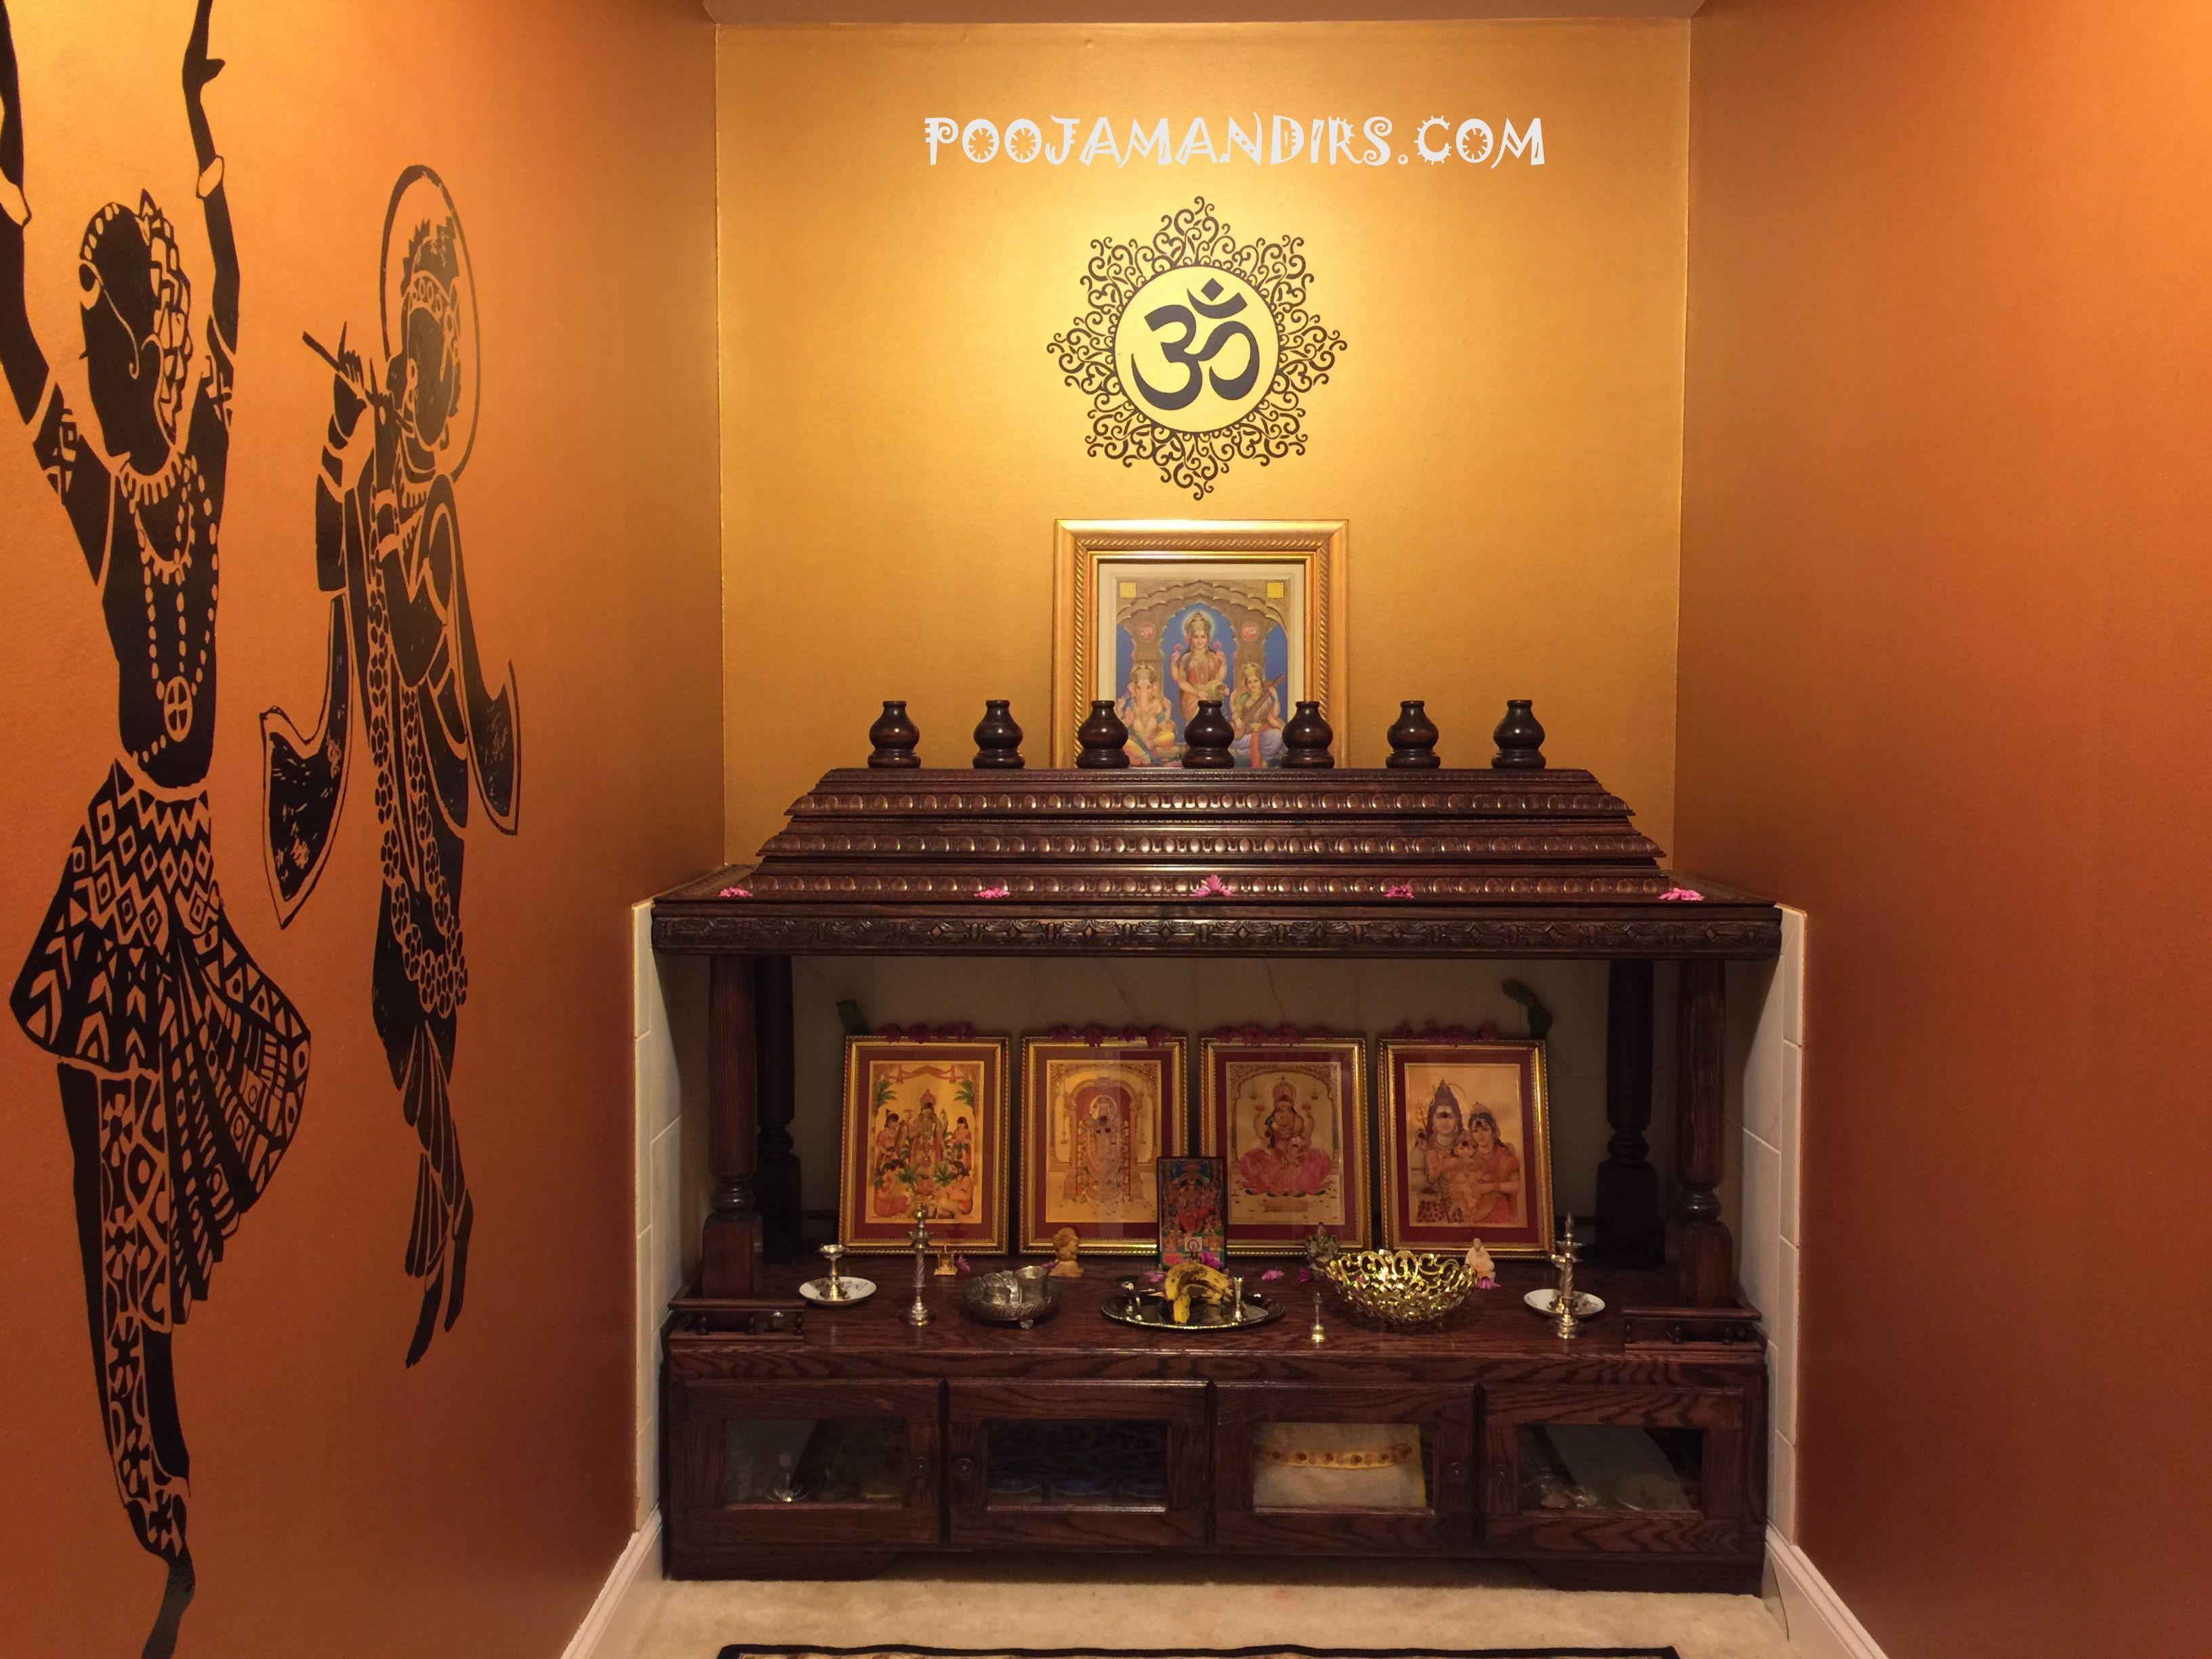 Pooja Mandirs USA - Chitra Collection - Open Model